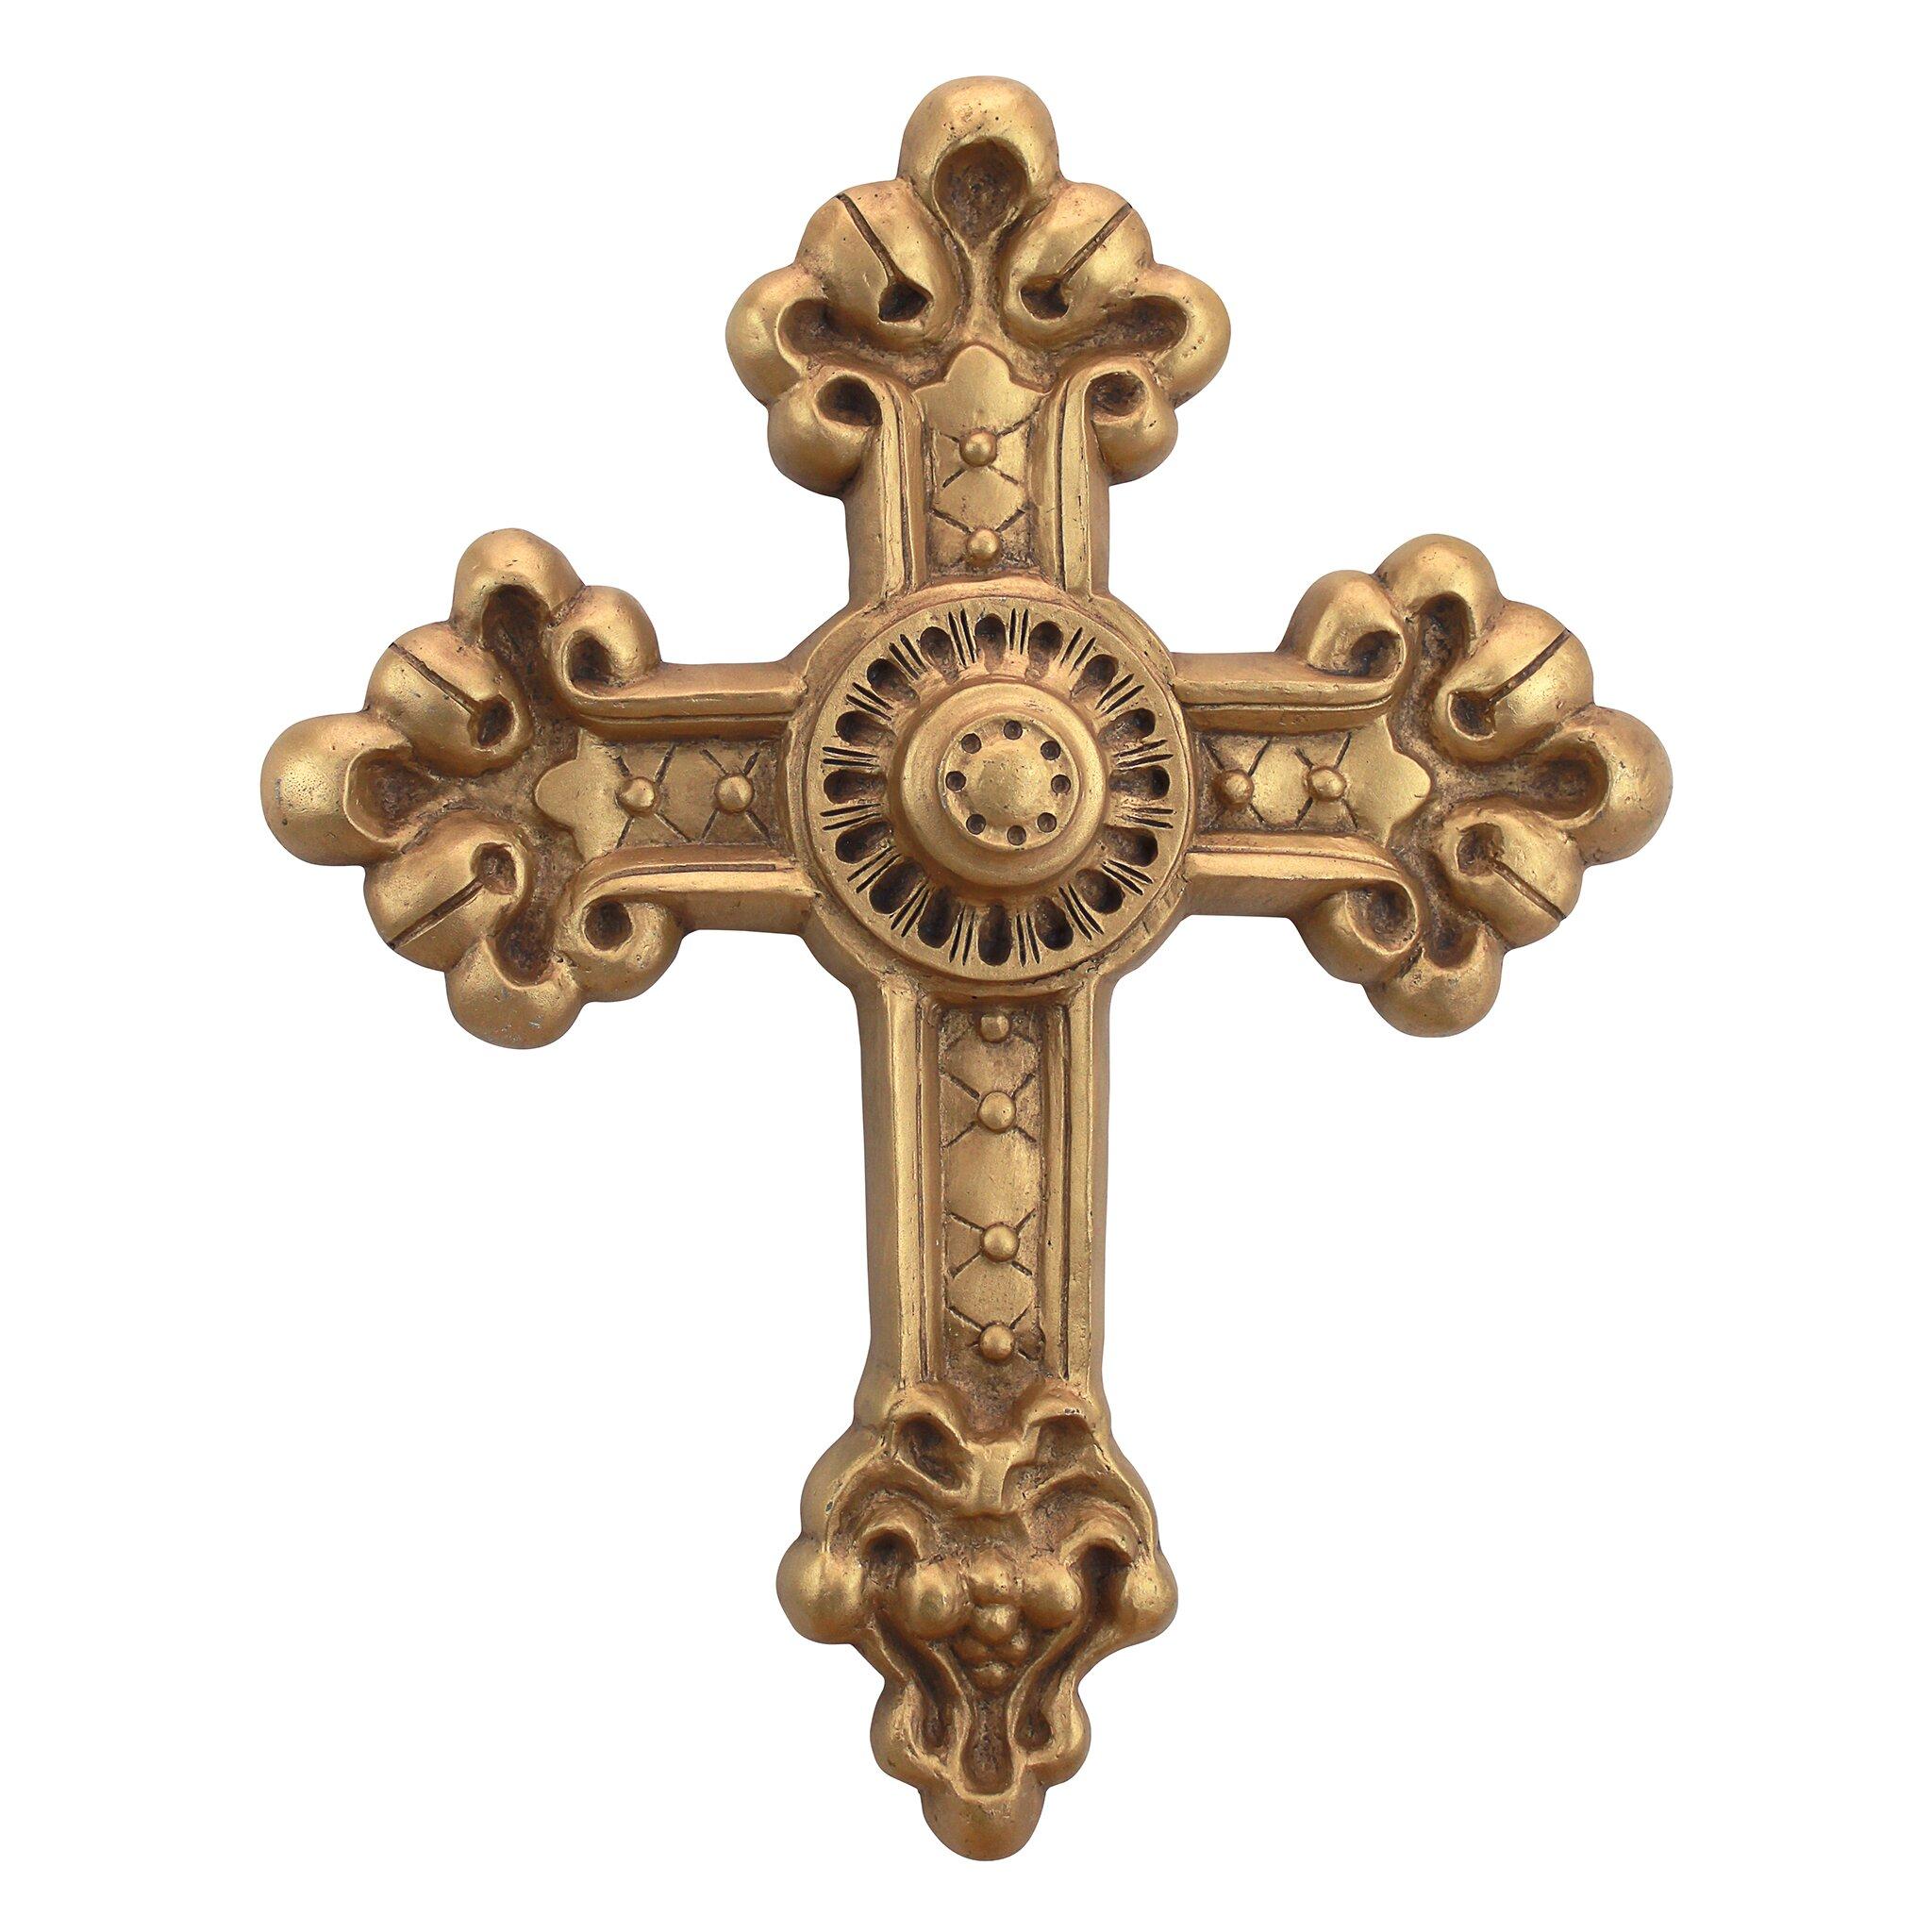 Bronze Wall Decor Design Toscano Baroque New World Cross Wall Dccor Reviews Wayfair